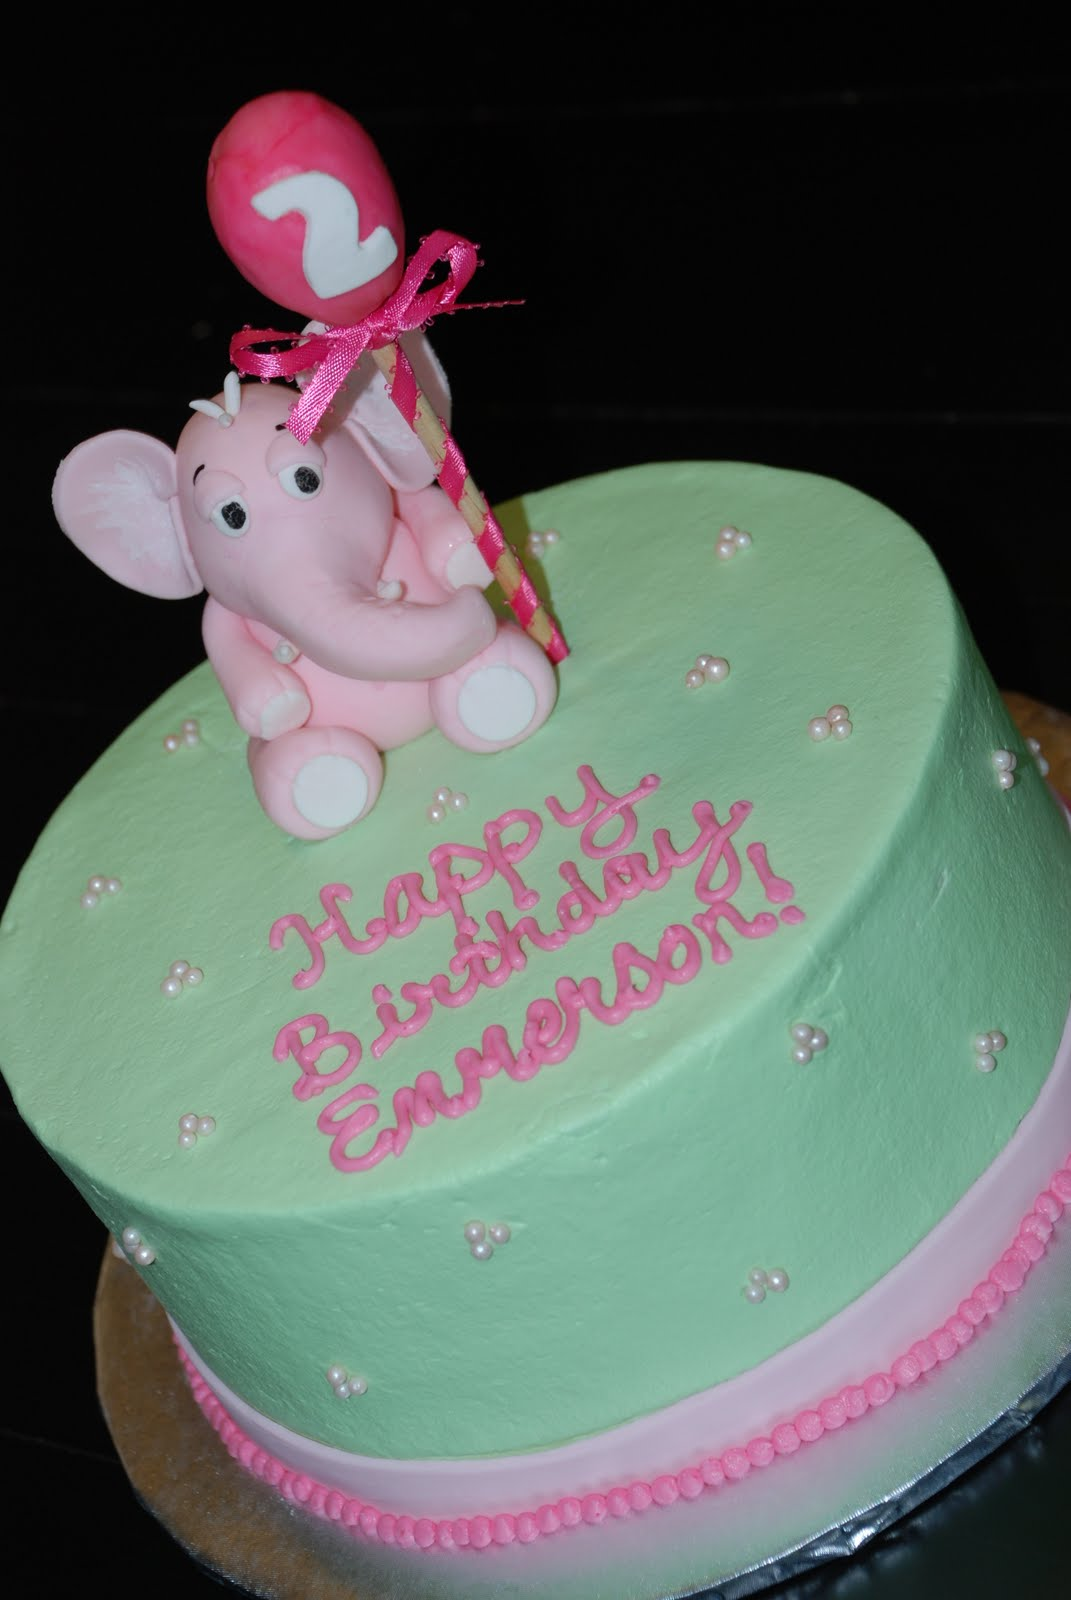 Swell Elephant Cakes Decoration Ideas Little Birthday Cakes Funny Birthday Cards Online Necthendildamsfinfo